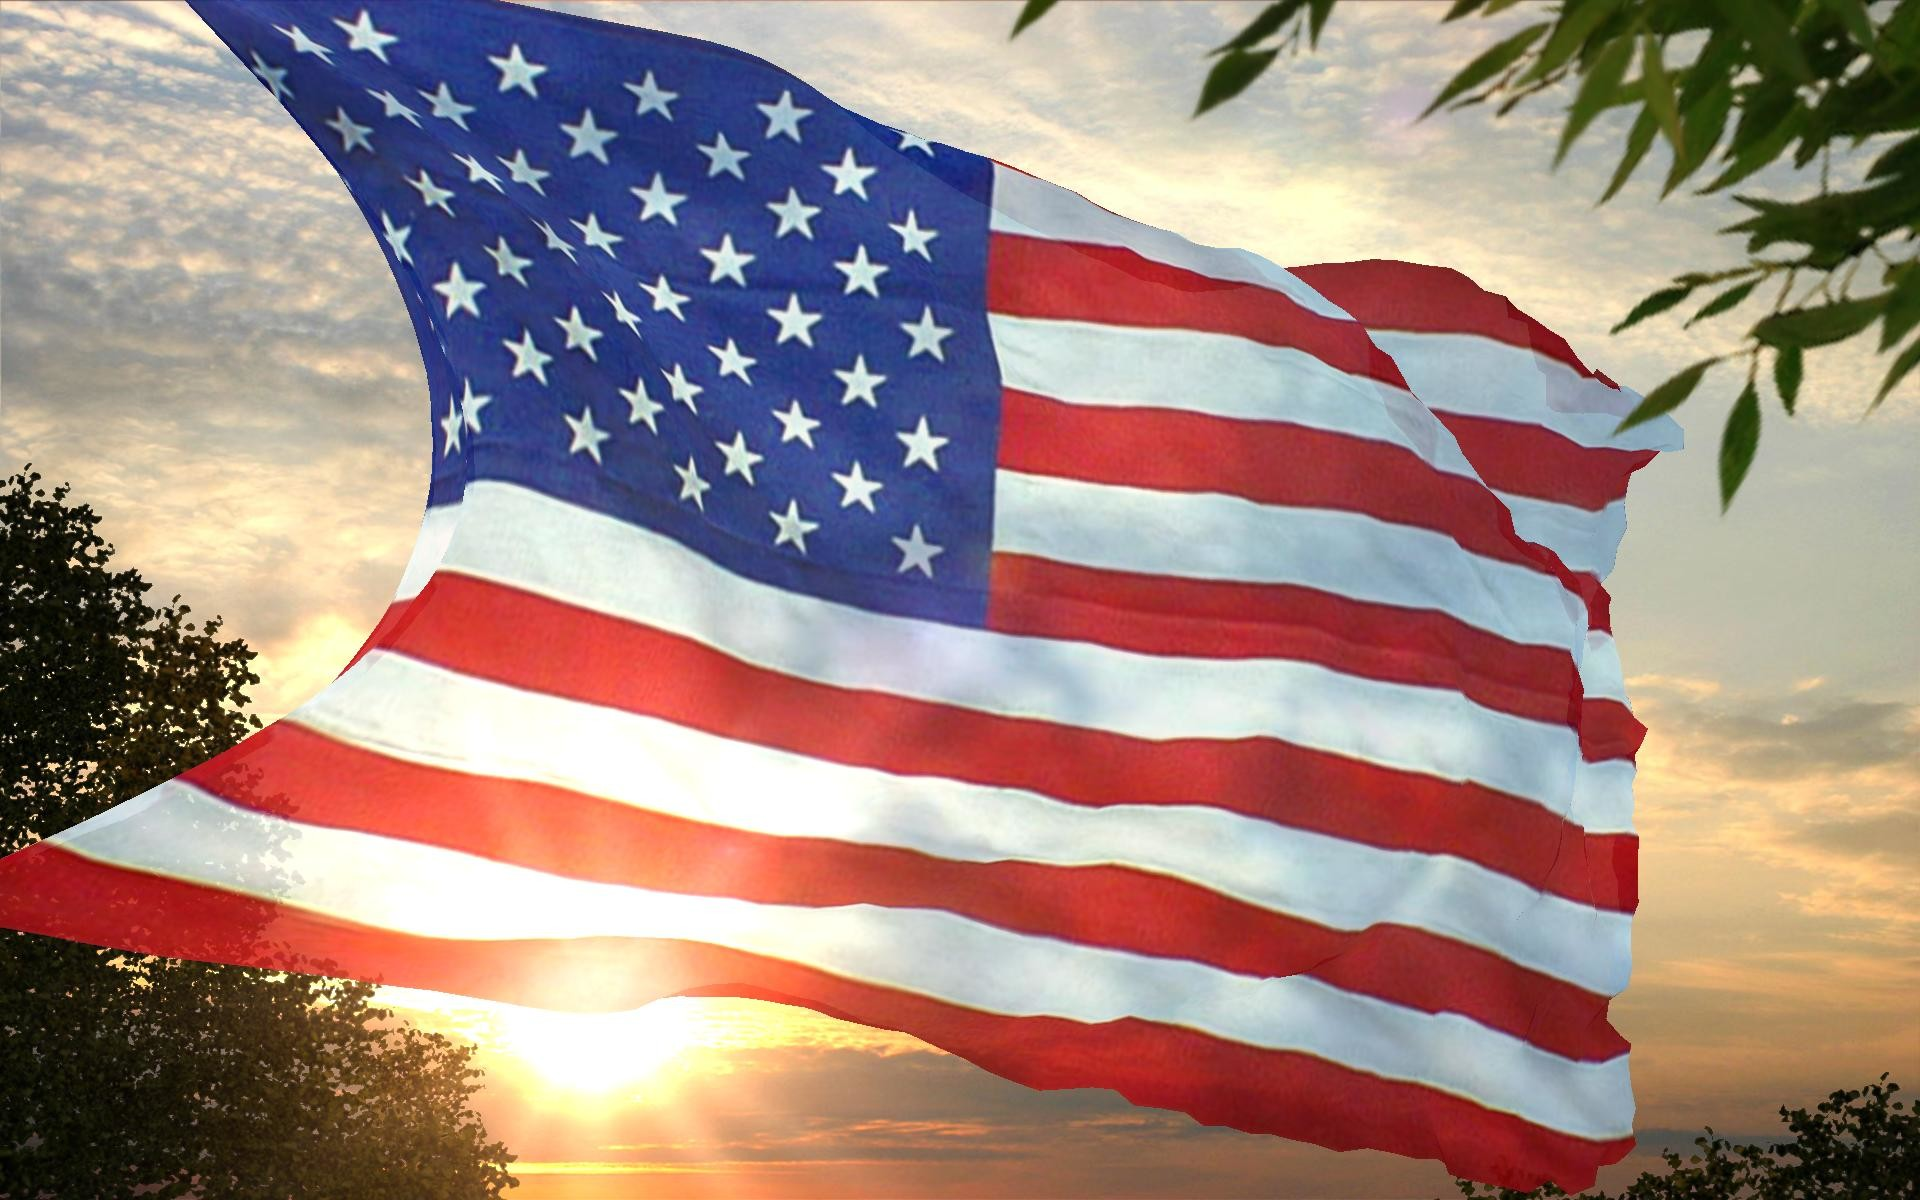 USA American Flag Wallpaper #13065 Wallpaper   Cool Walldiskpaper.com